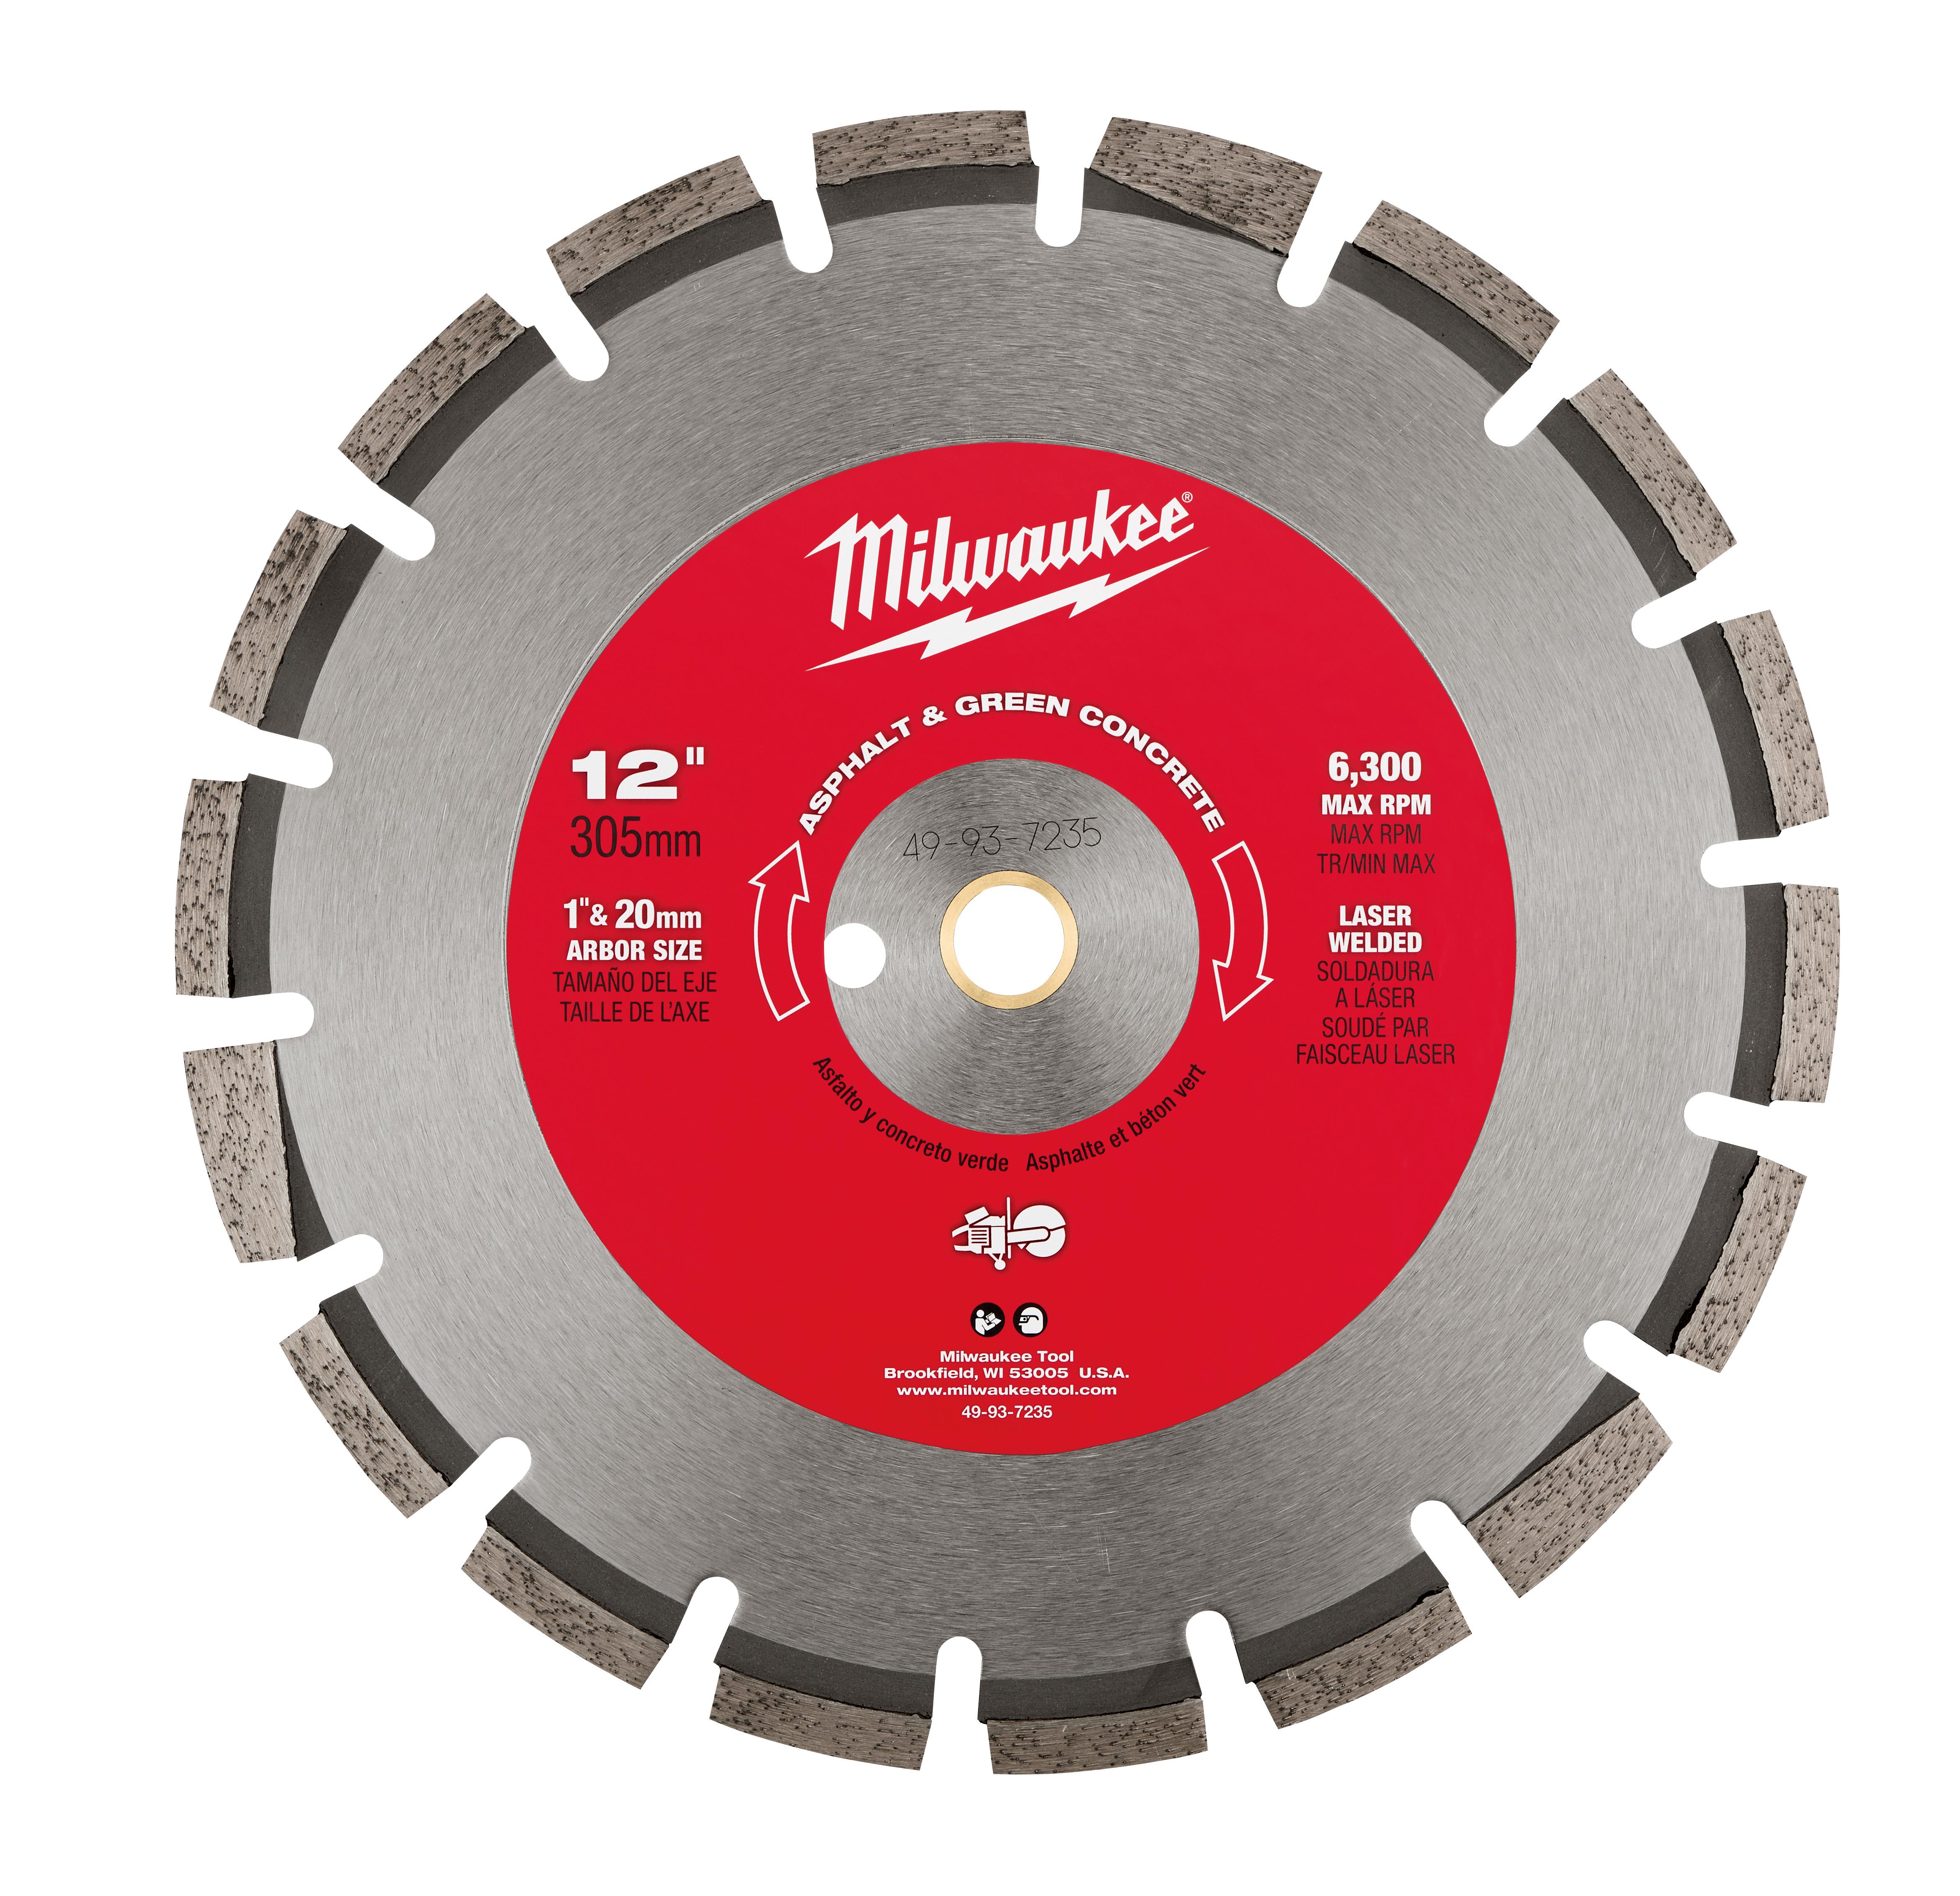 Milwaukee® 49-93-7235 Circular Segmented Diamond Blade, 12 in Dia Blade, 1/8 in W, 1 in Arbor/Shank, Dry/Wet Cutting